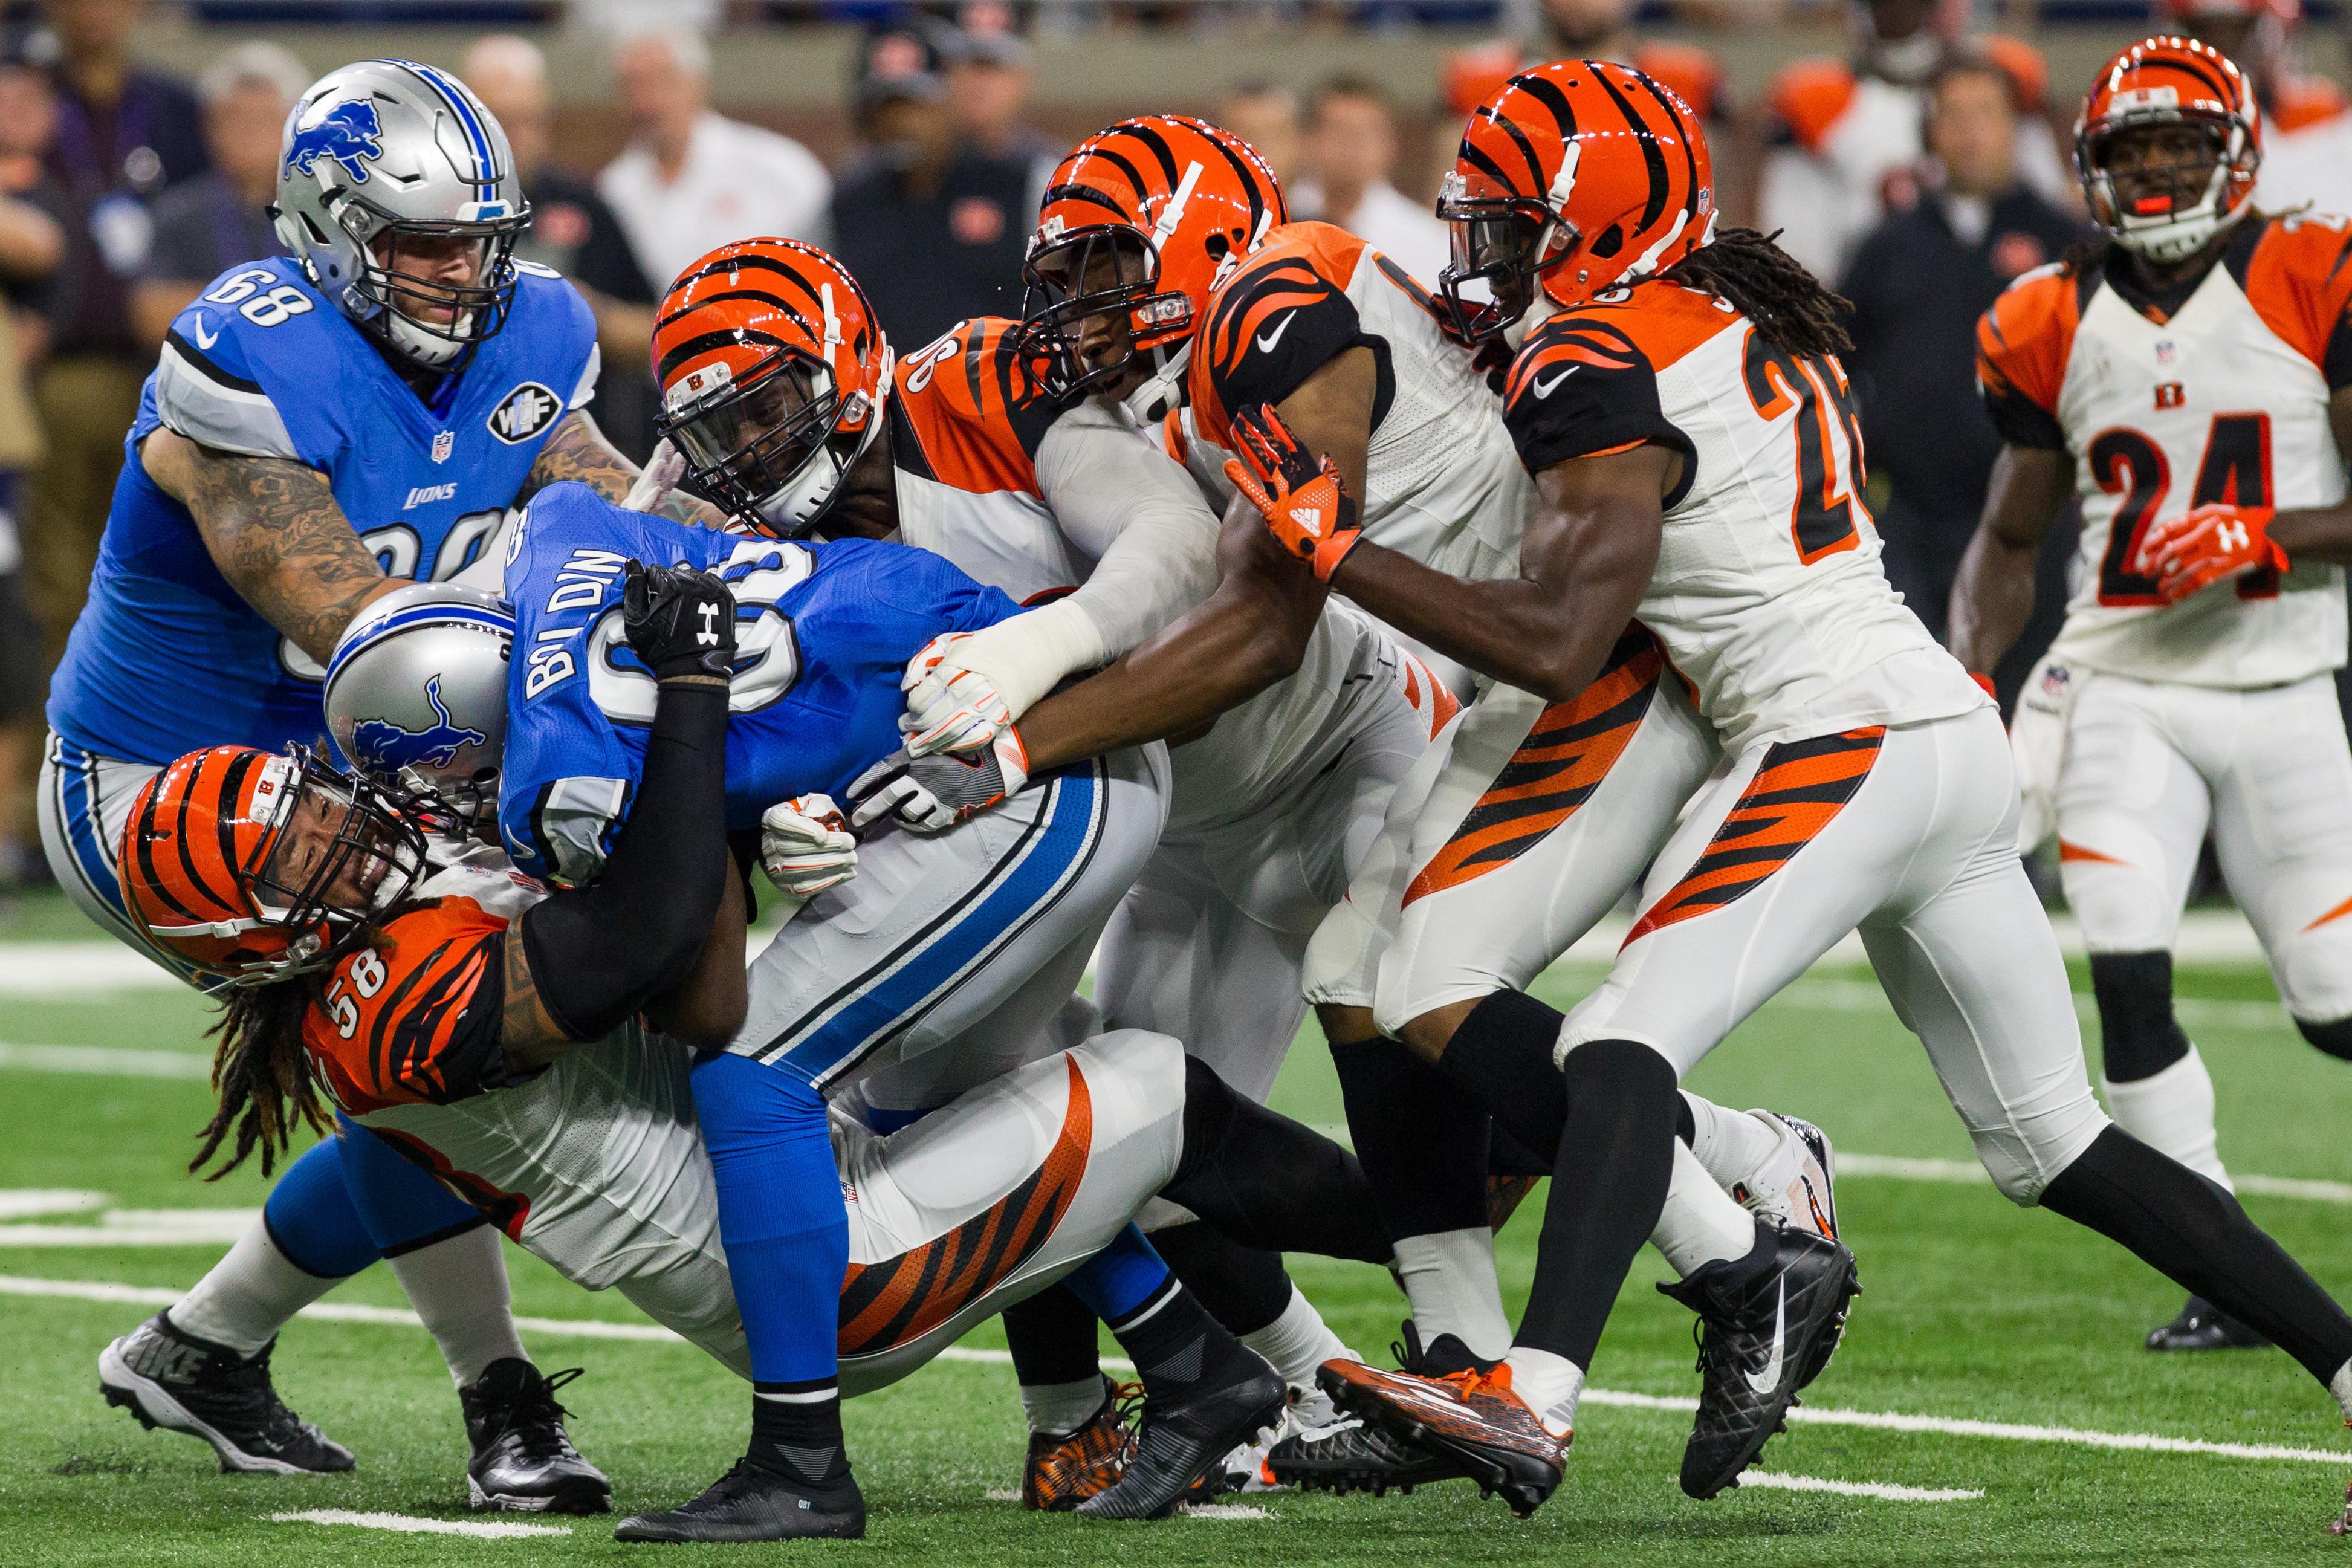 NFL: AUG 18 Preseason - Bengals at Lions